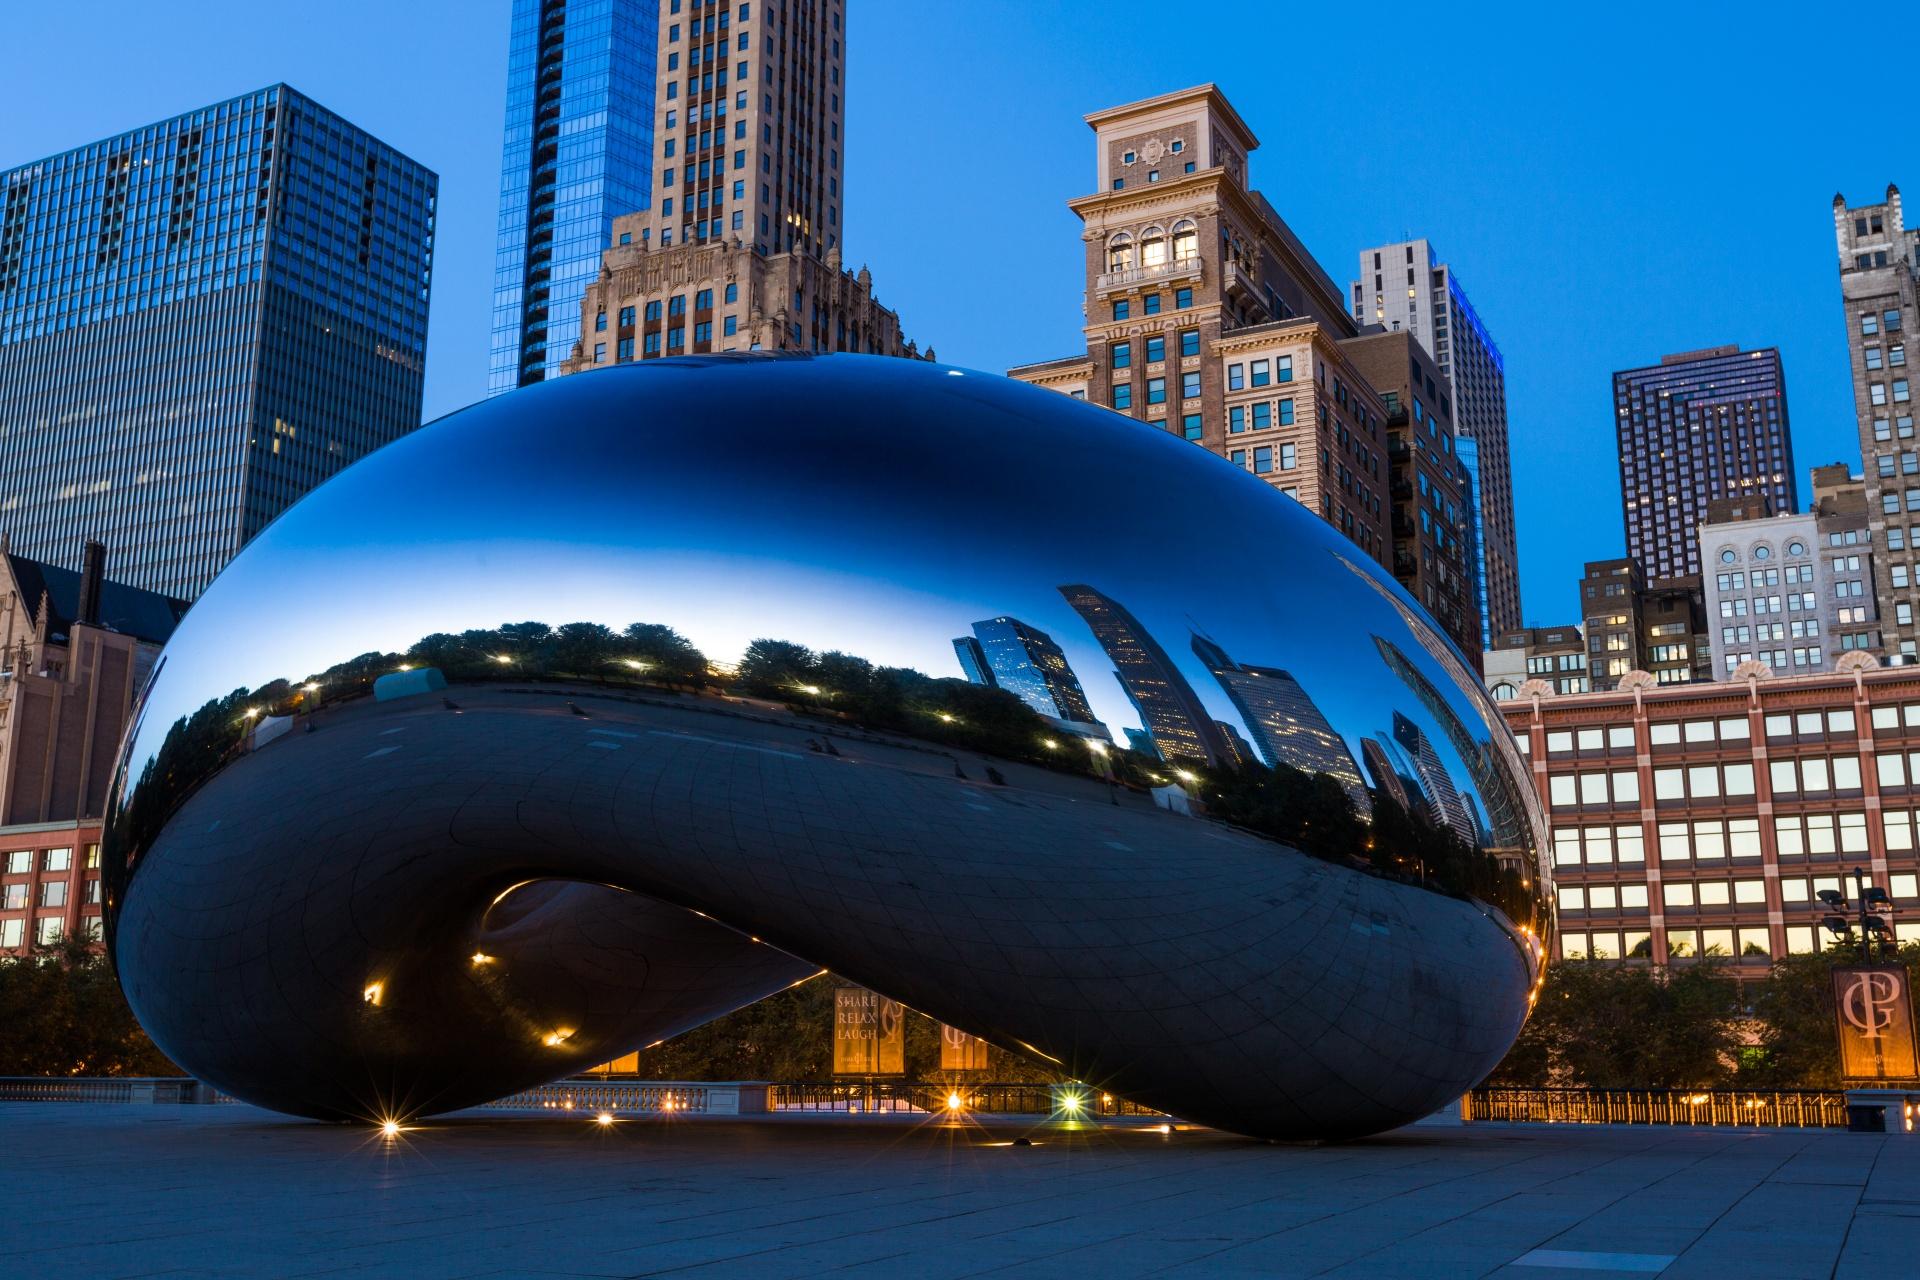 chicago-cloud-gate-1479046062kHv.jpg